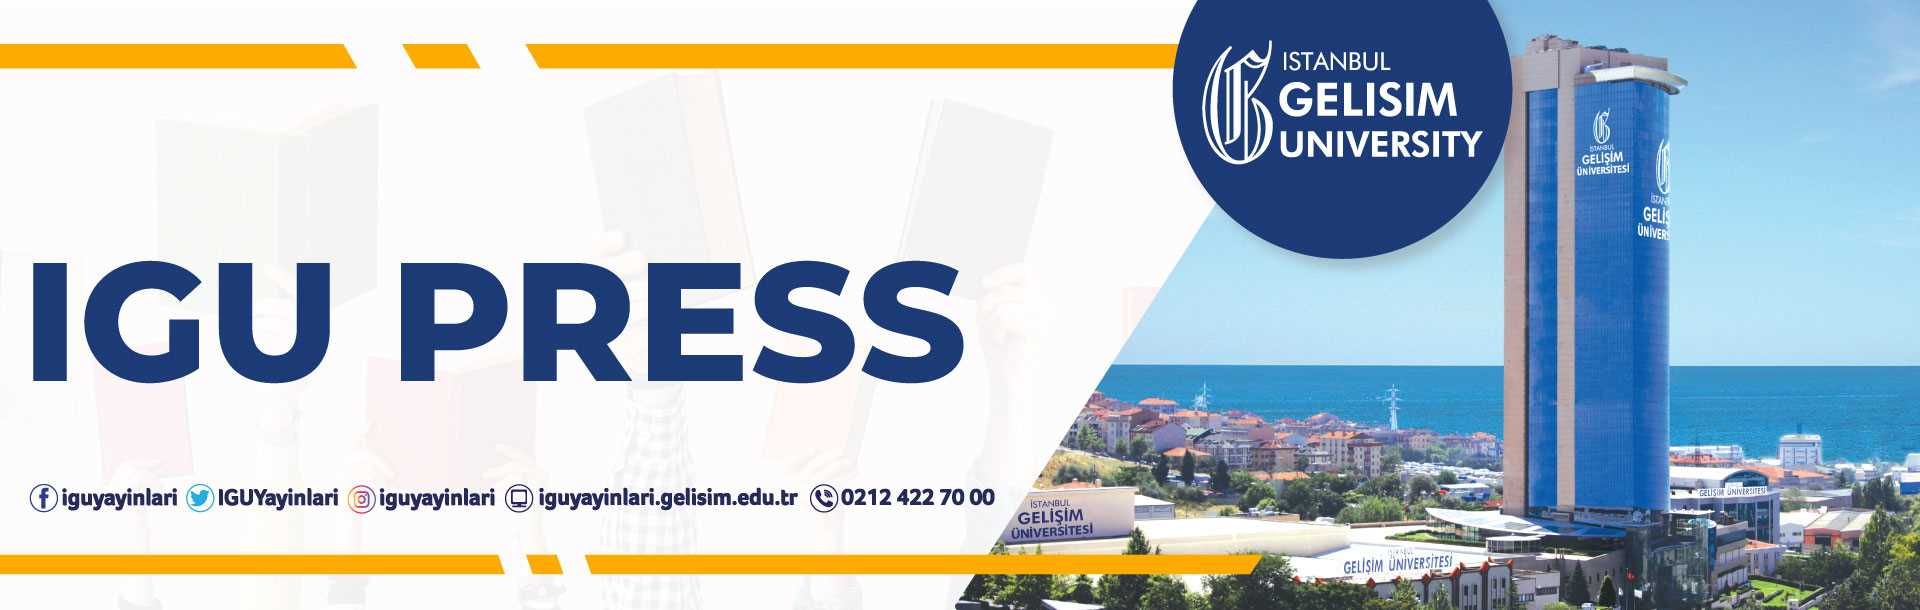 Istanbul Gelisim University Publications